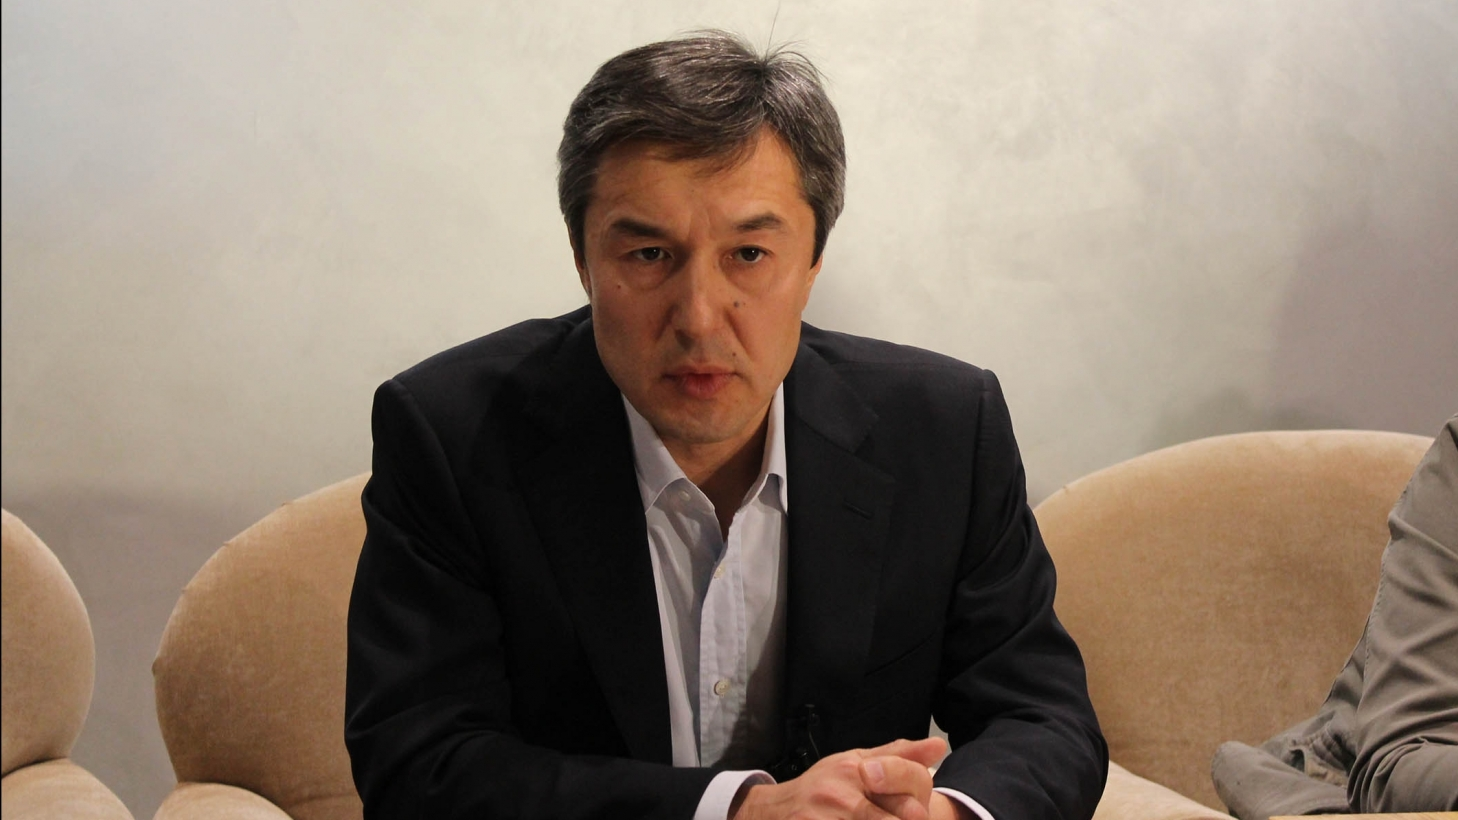 Досье: Баталов Раимбек Анварович , Раимбек Баталов,НПП Атамекен